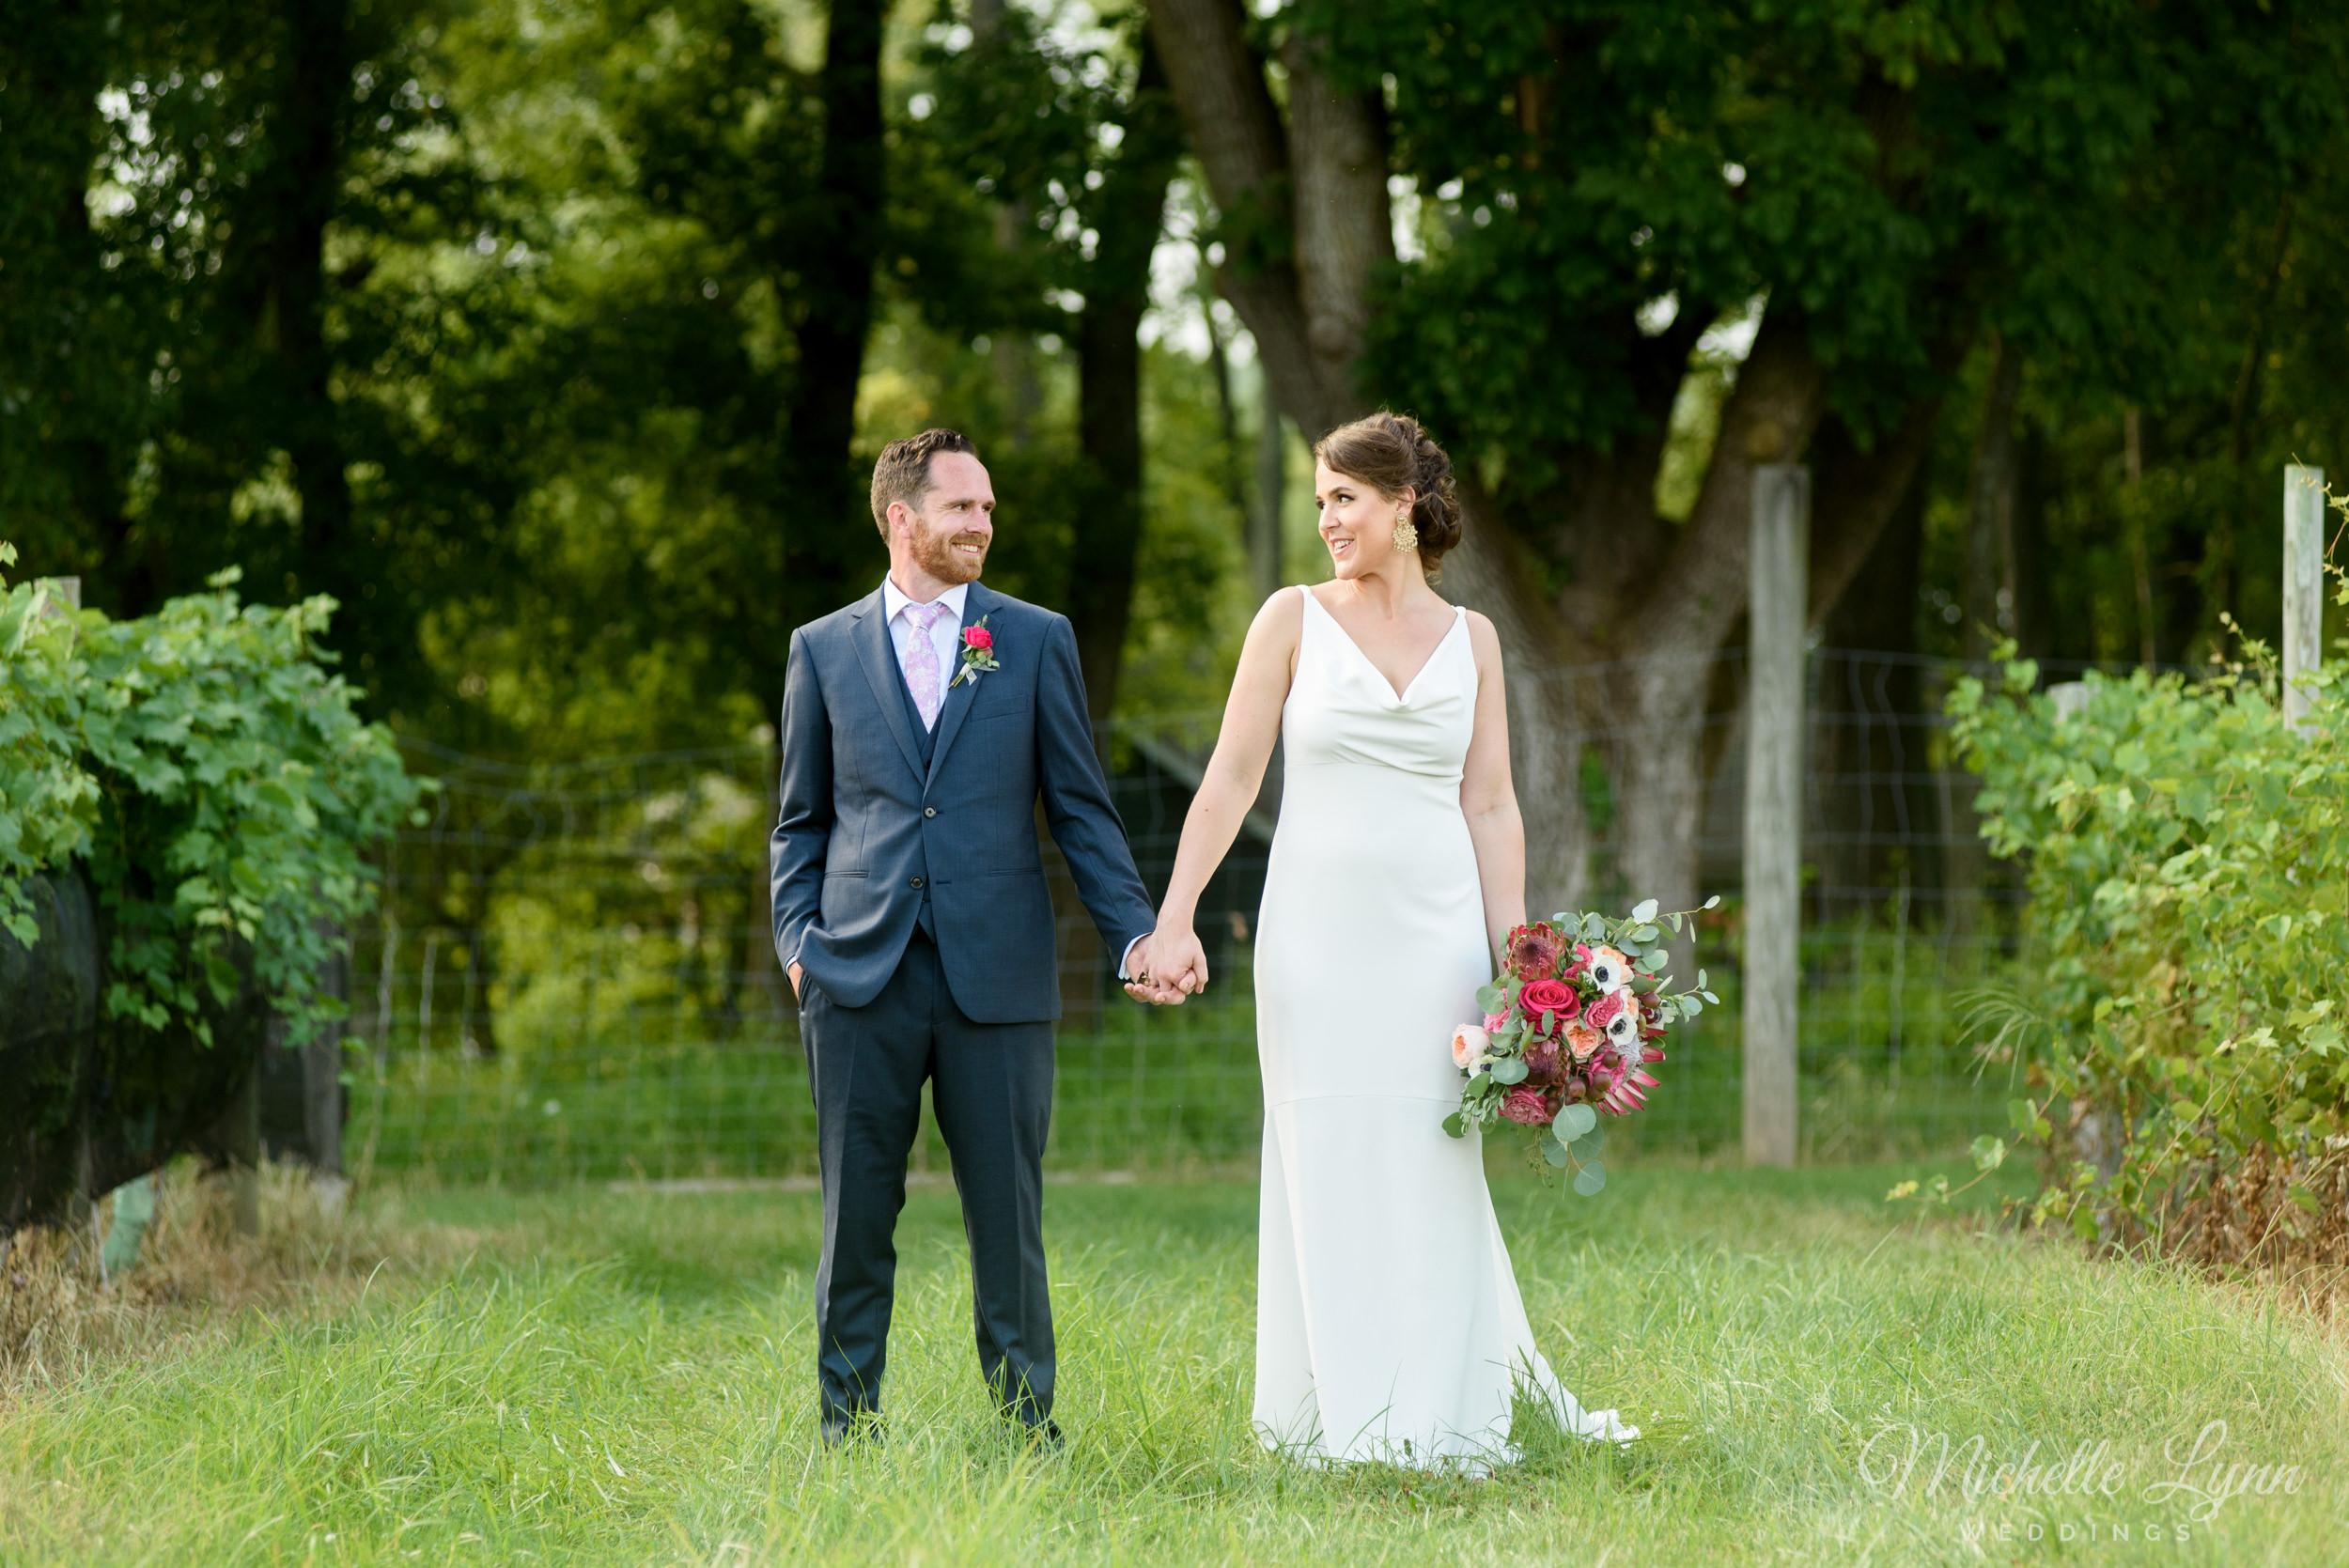 mlw-unionville-vineyards-nj-wedding-photography-64.jpg